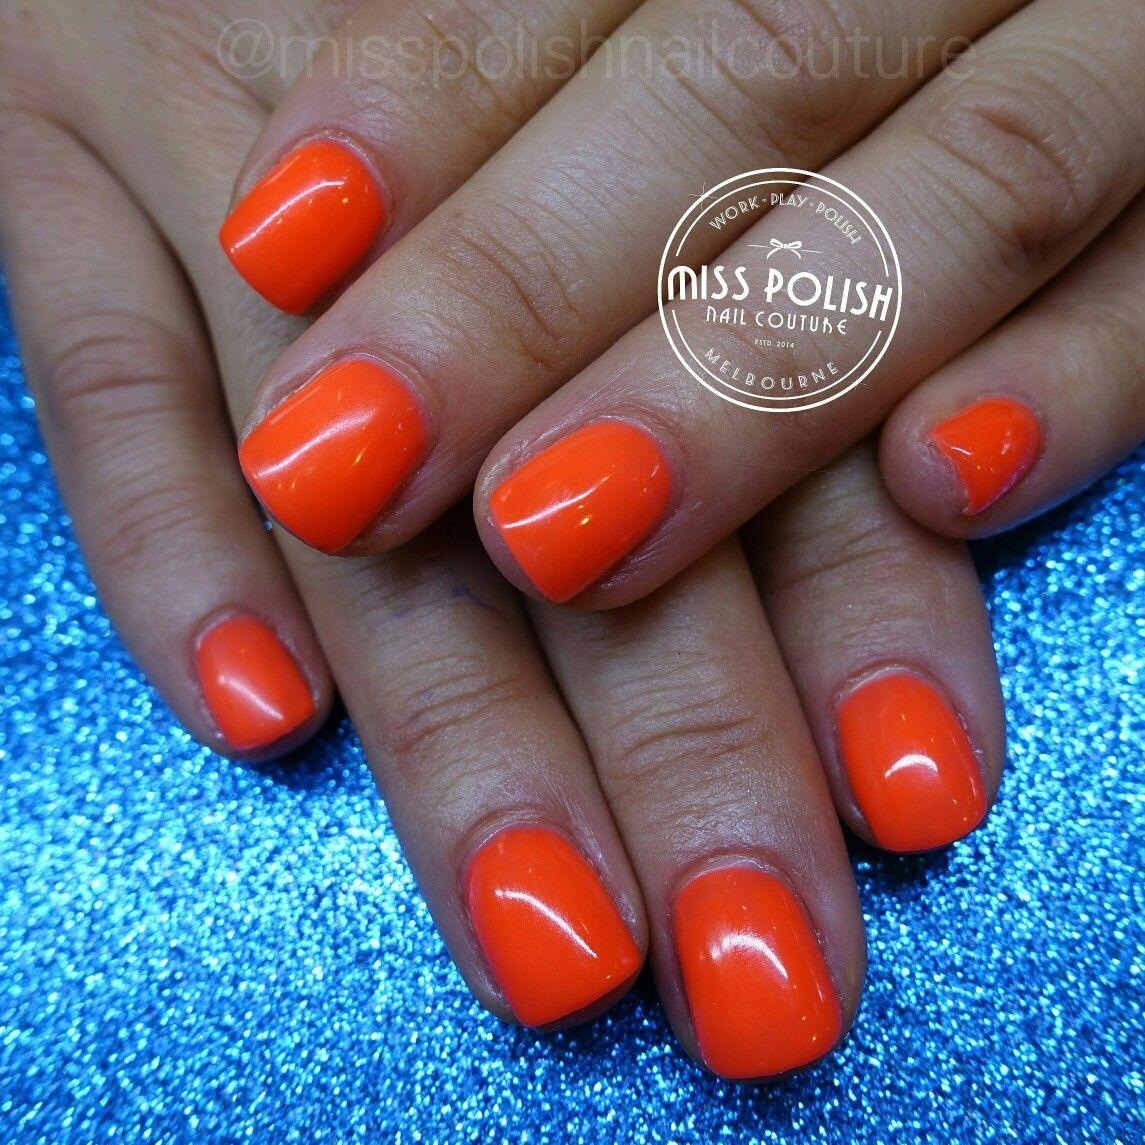 Hard Gel Gel Nails Neon Nails Orange Nails Short Nails Miss